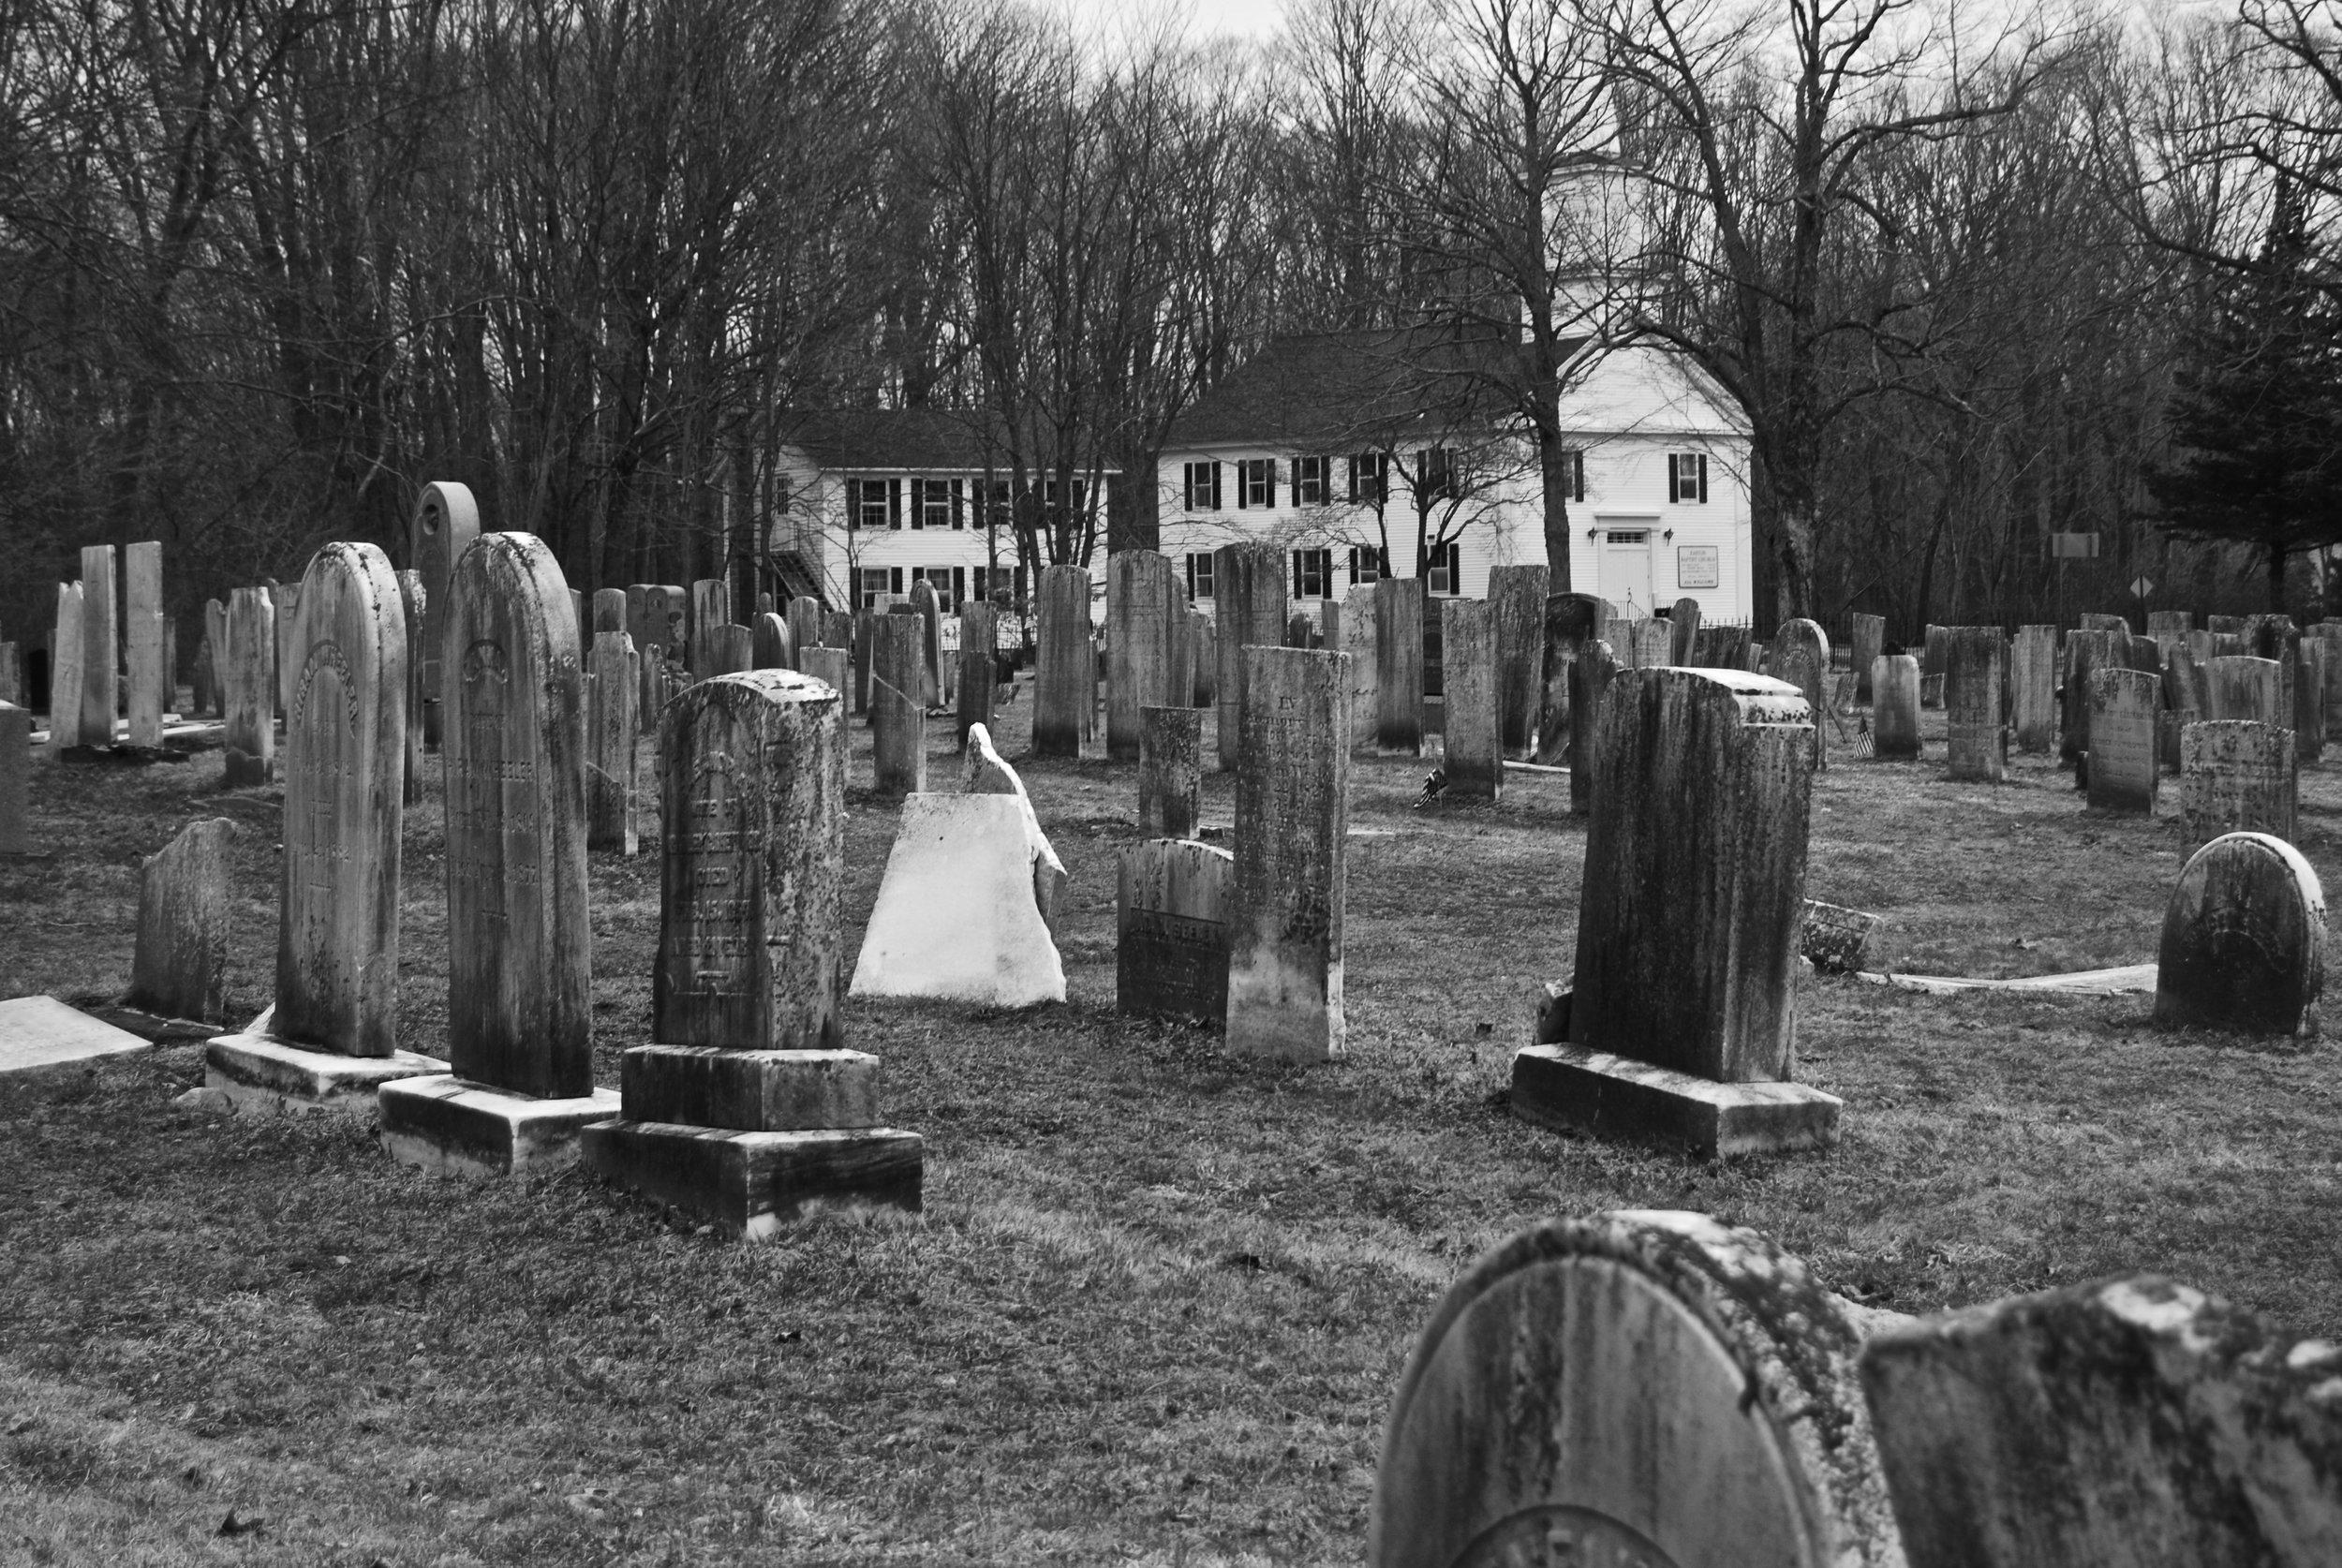 ahauntedworld/union-cemetery